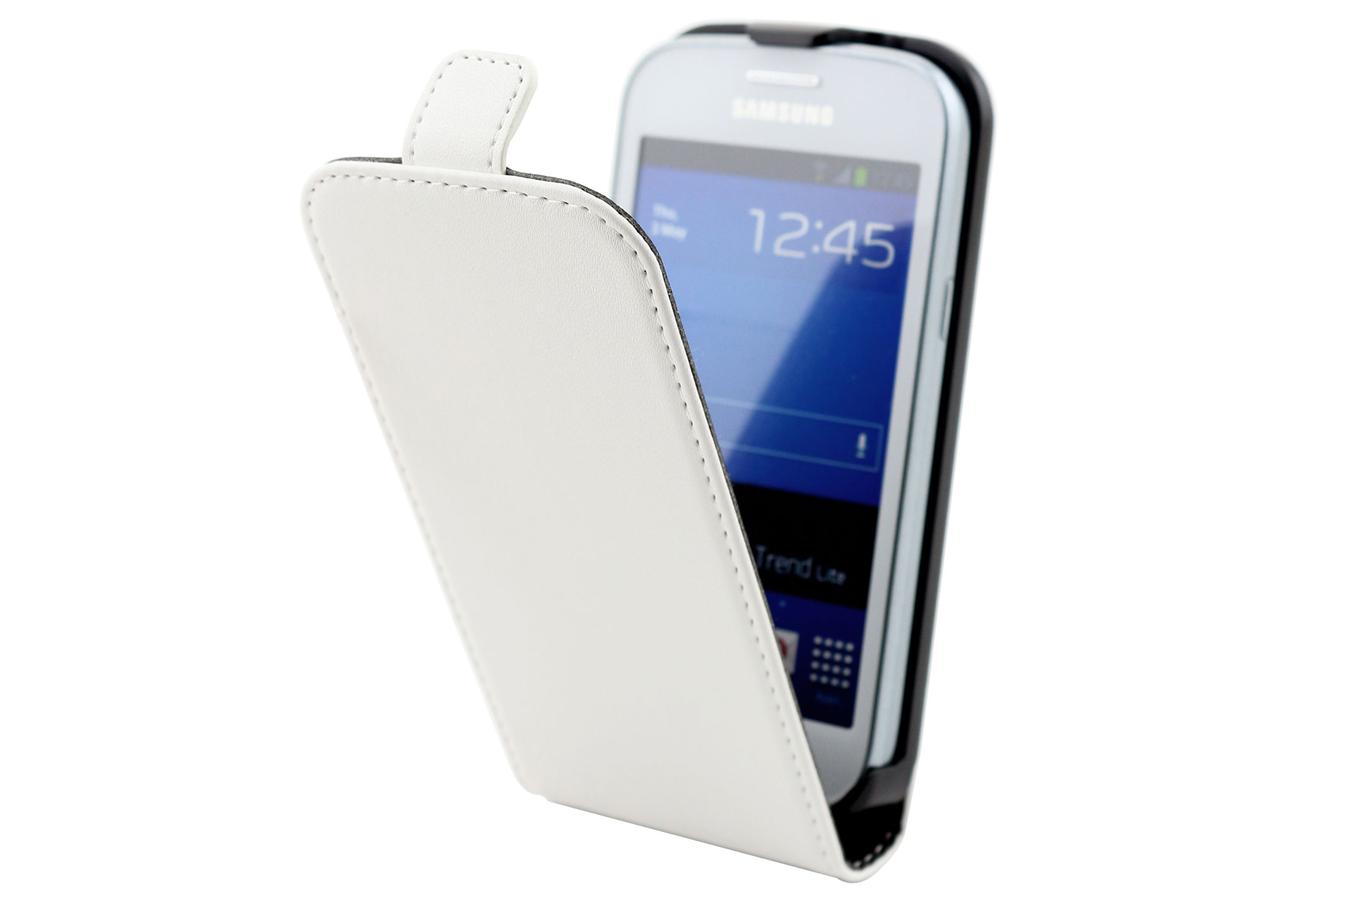 Coque smartphone muvit etui rabat blanc pour samsung - Coque samsung galaxy trend lite blanc ...